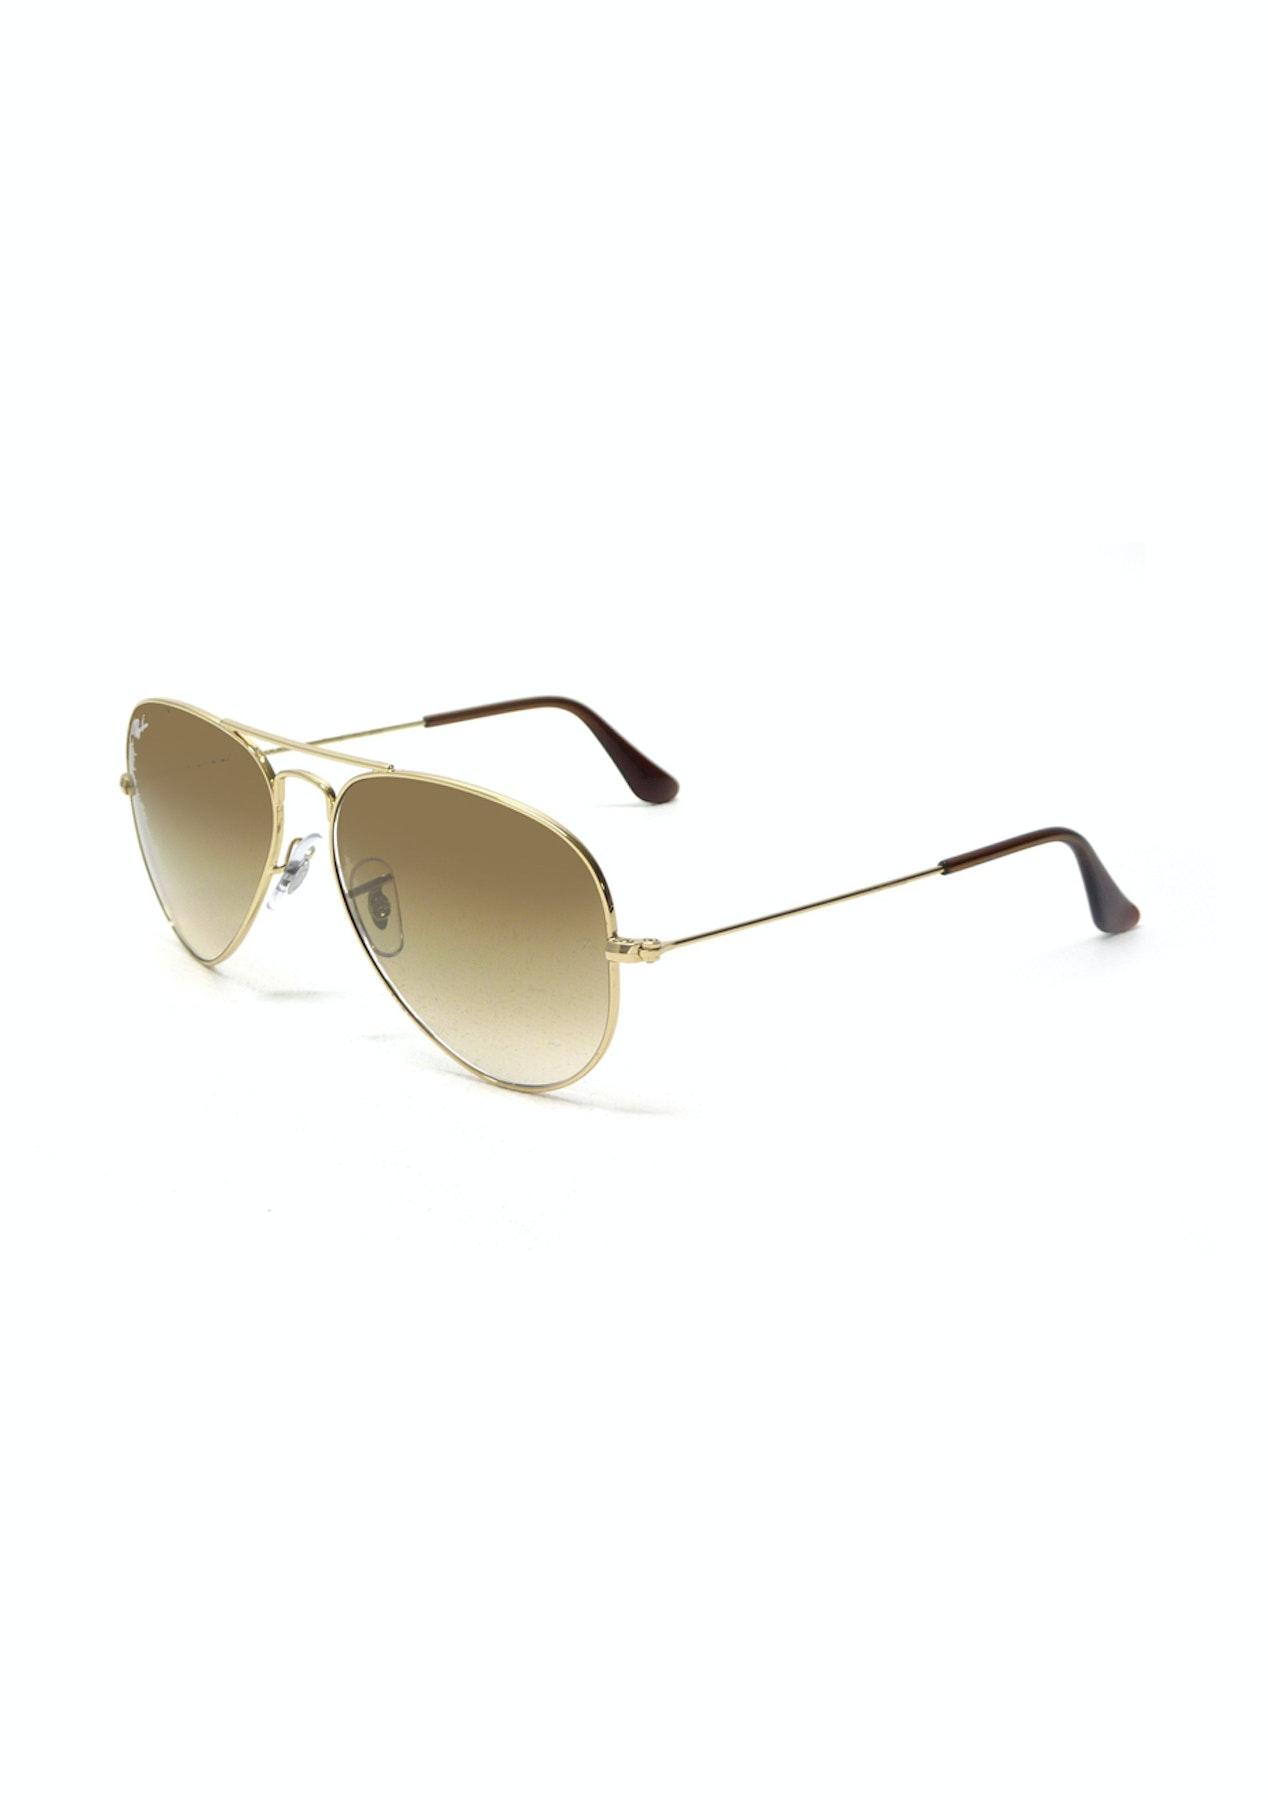 f306465b5b1 Ray-Ban - RB3025 001 51 55 - AVIATOR GRADIENT Gold - Big Brand Sunglasses -  Onceit